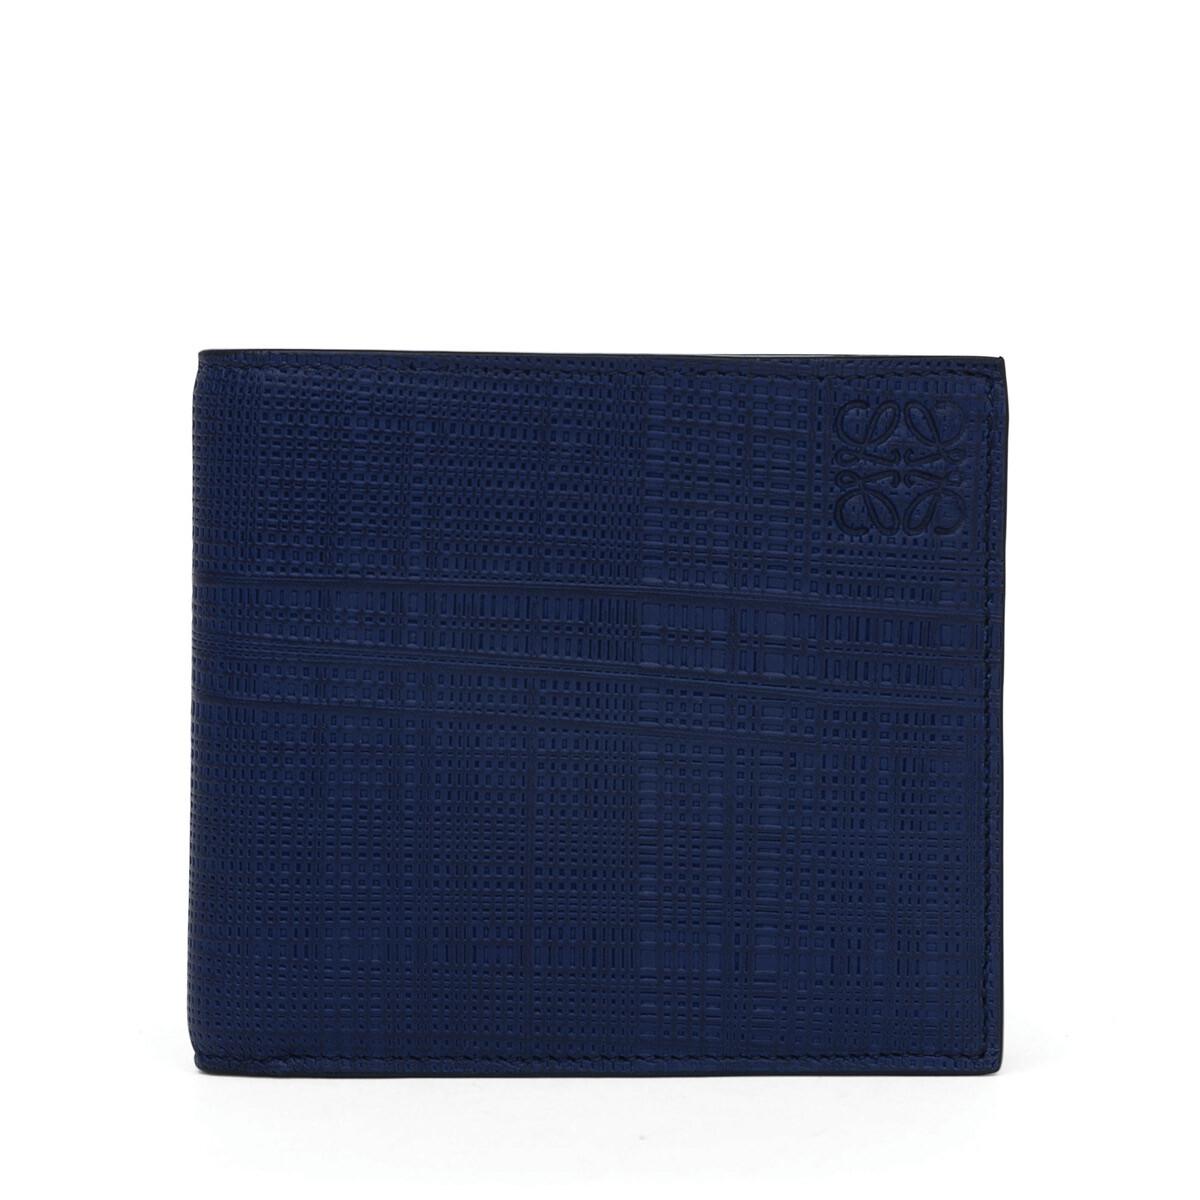 LOEWE Linen Bifold/Coin Wallet Navy Blue front